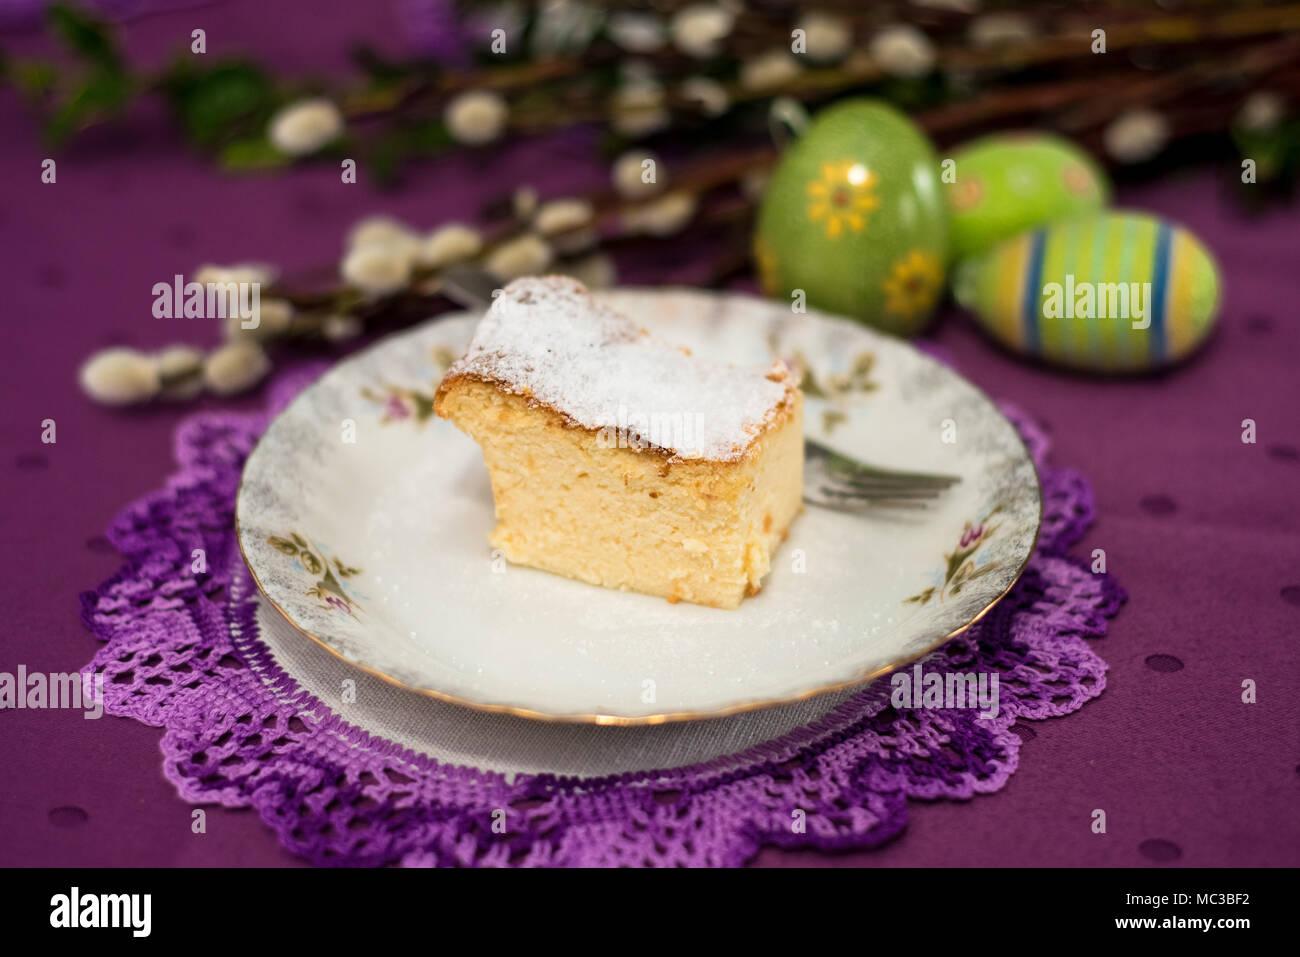 Cheesecake - homemade easter cake - Stock Image